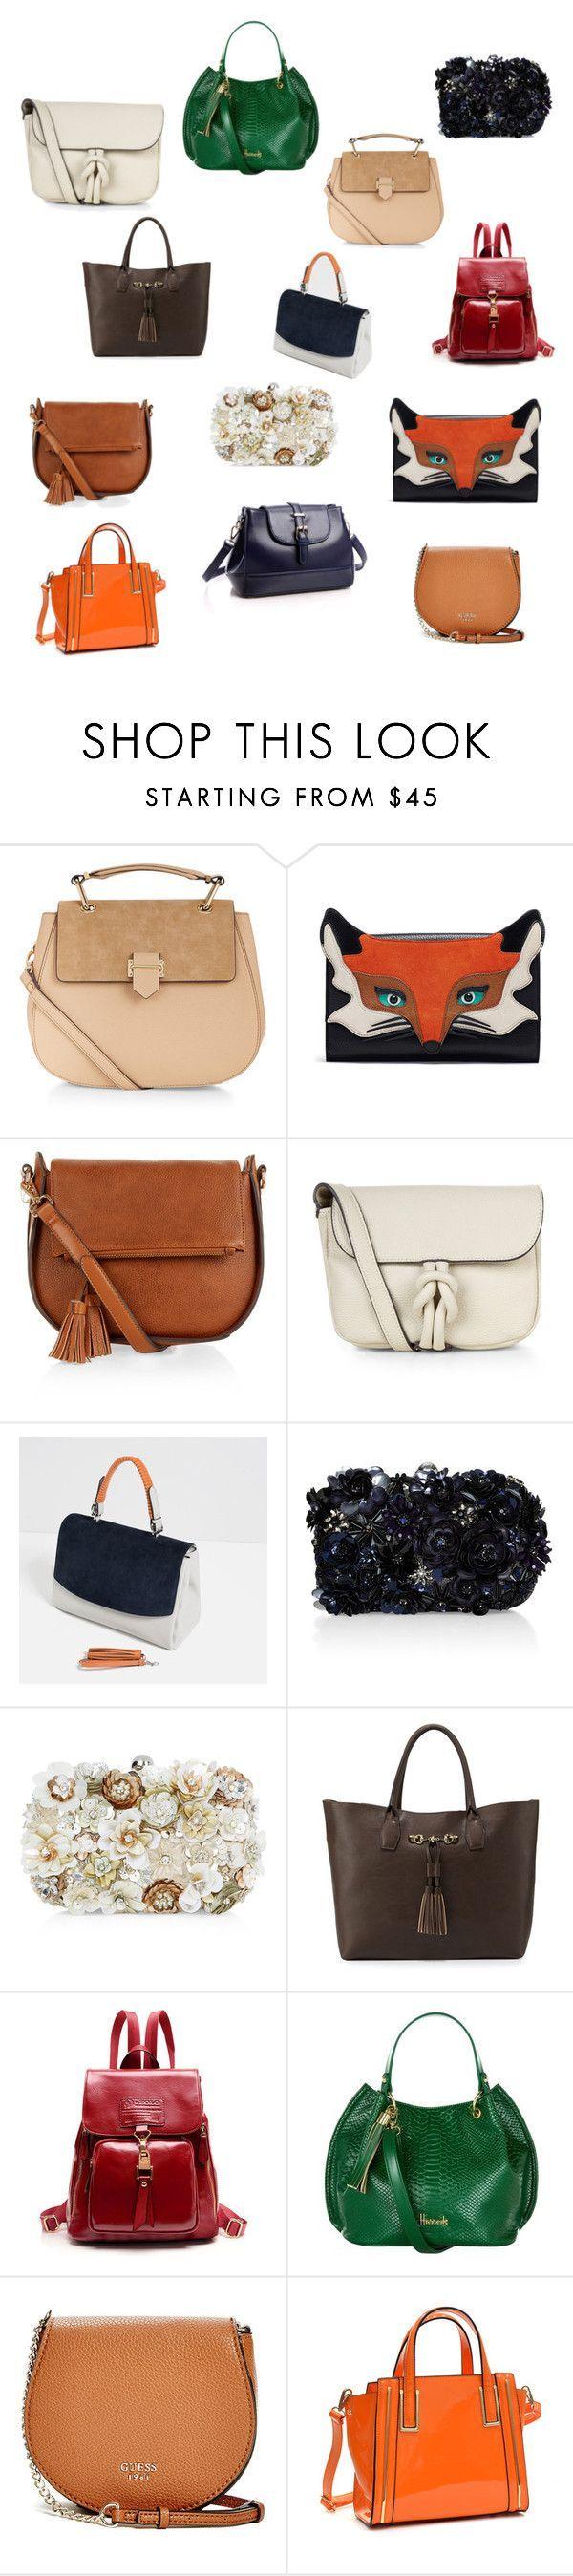 """Classy affordable handbags under $100.00!!!!"" by preppypinkgreen ❤ liked on Polyvore featuring Accessorize, Monsoon, Zara, Neiman Marcus, Harrods, GUESS, Dasein, women's clothing, women and female - handbags for women on sale, shop handbags online, big handbags *sponsored https://www.pinterest.com/purses_handbags/ https://www.pinterest.com/explore/handbag/ https://www.pinterest.com/purses_handbags/radley-handbags/ http://www.polyvore.com/handbags/shop?category_id=318"